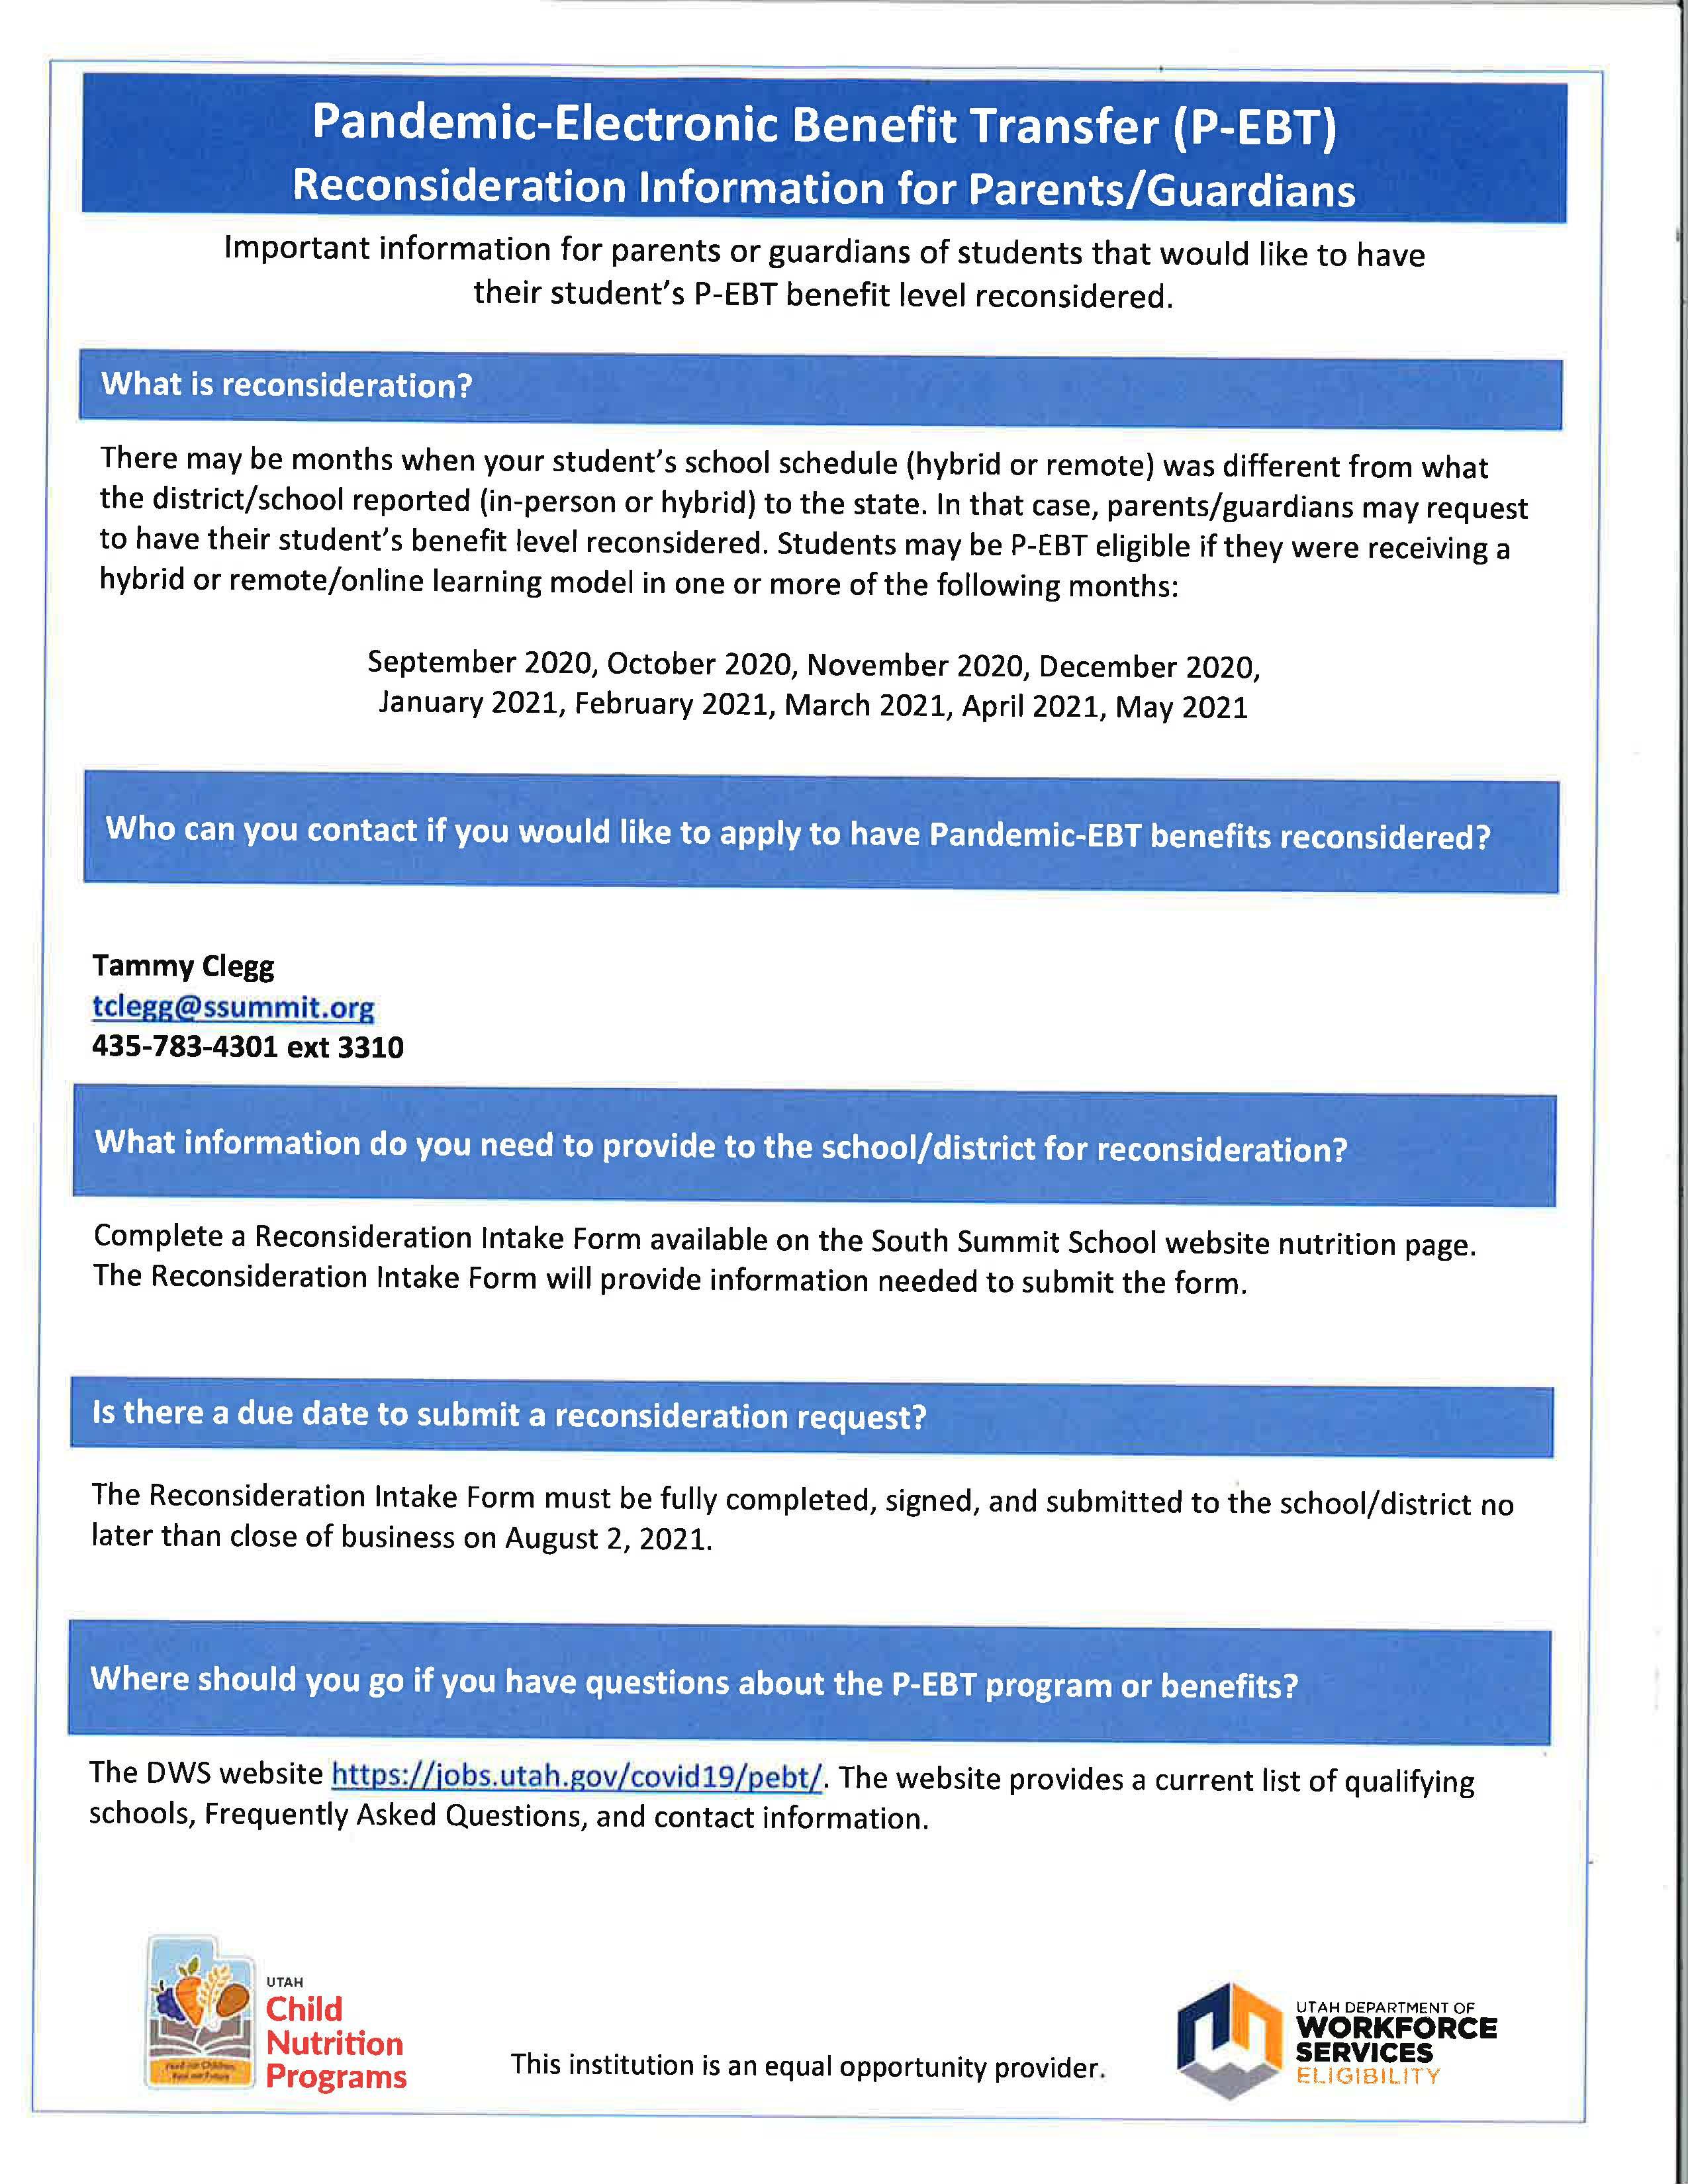 reconsideration flyer